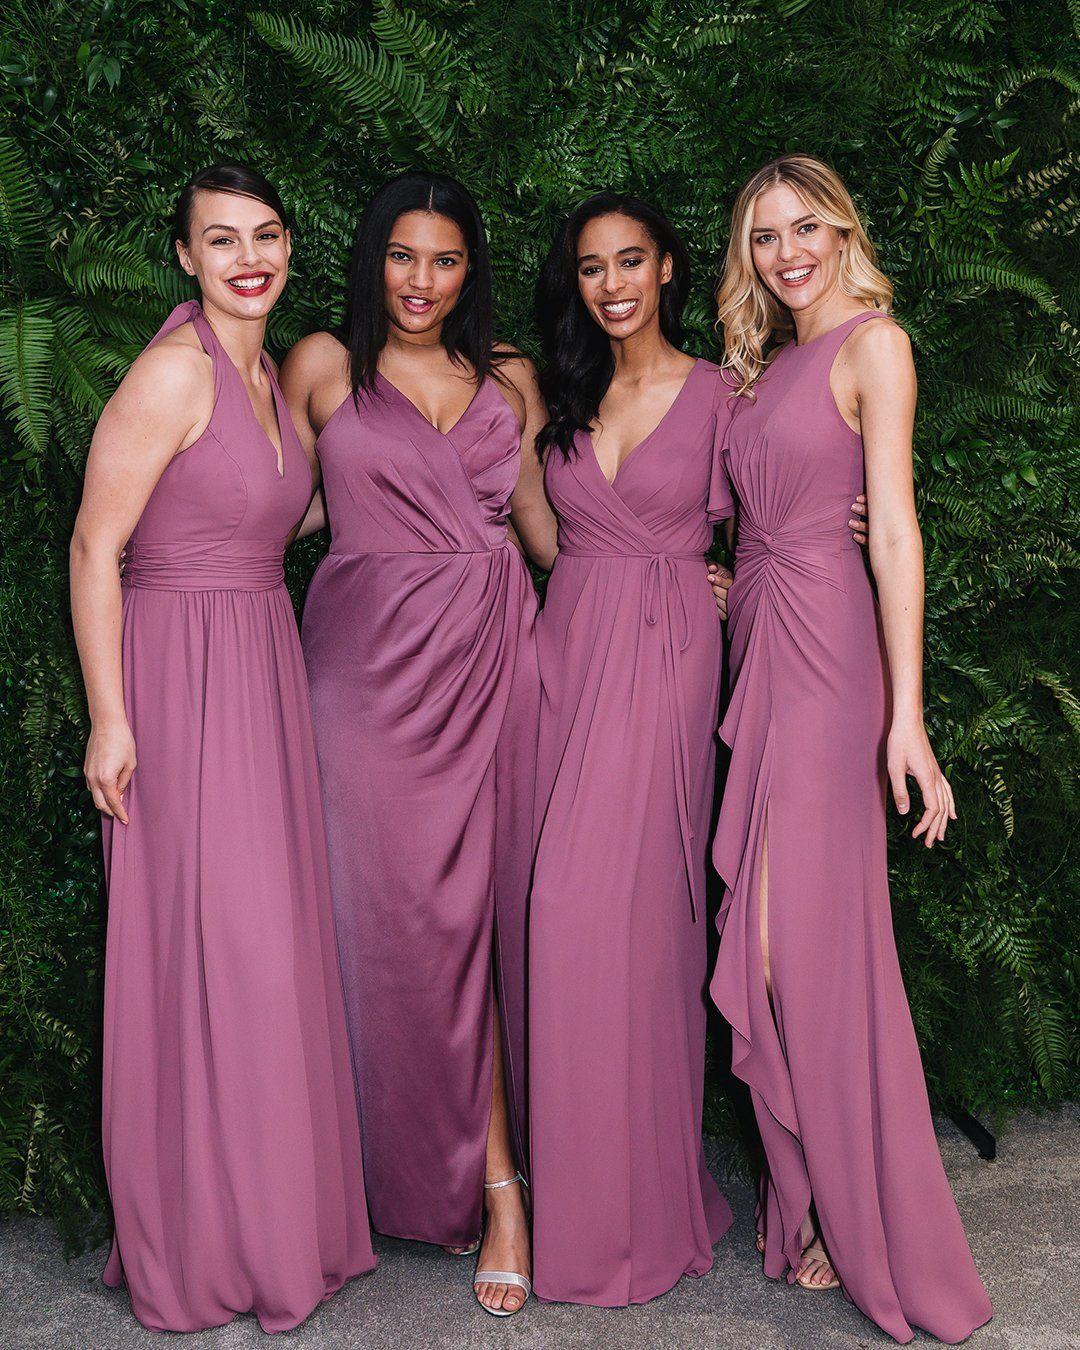 2019 Fall Bridesmaid Dresses David S Bridal Blog Davids Bridal Bridesmaid Dresses Purple Bridesmaid Dresses Latest Bridesmaid Dresses